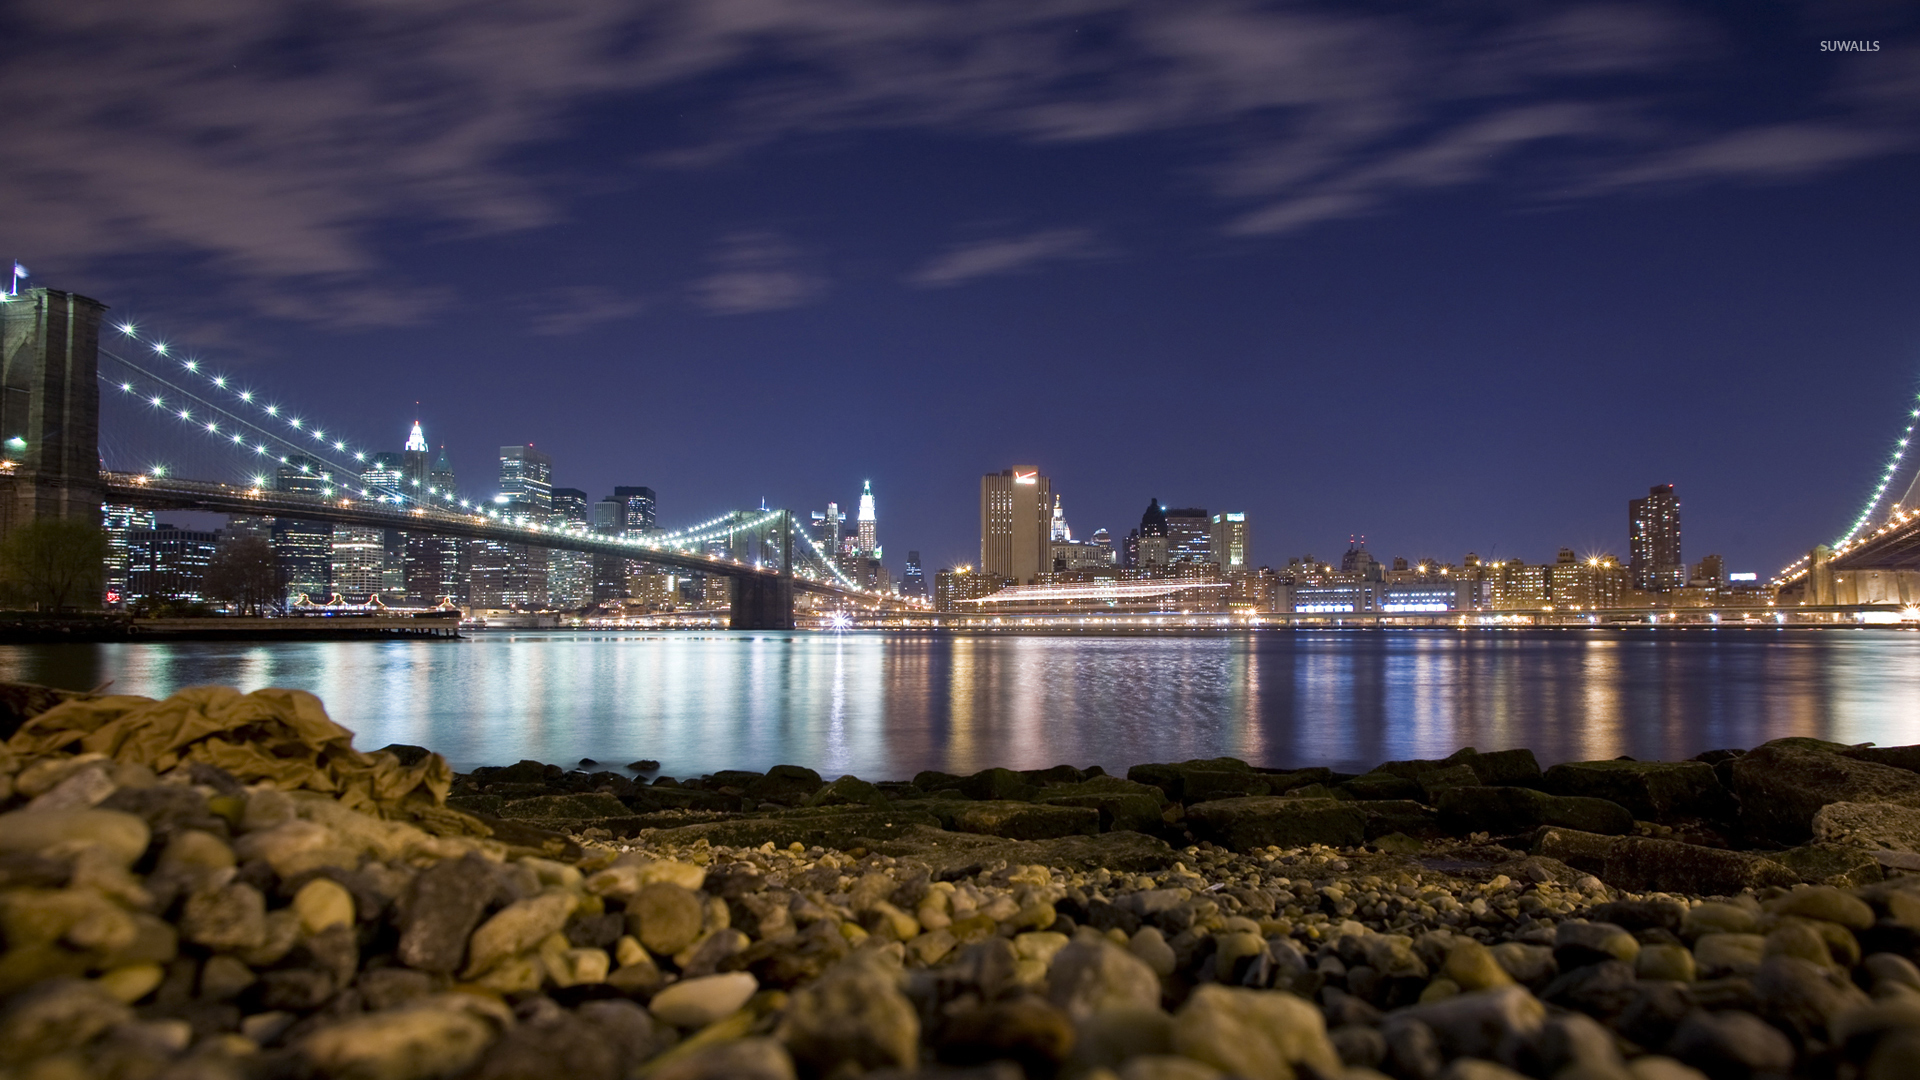 Simple Wallpaper Night Brooklyn Bridge - brooklyn-bridge-at-night-897-1920x1080  Gallery.jpg